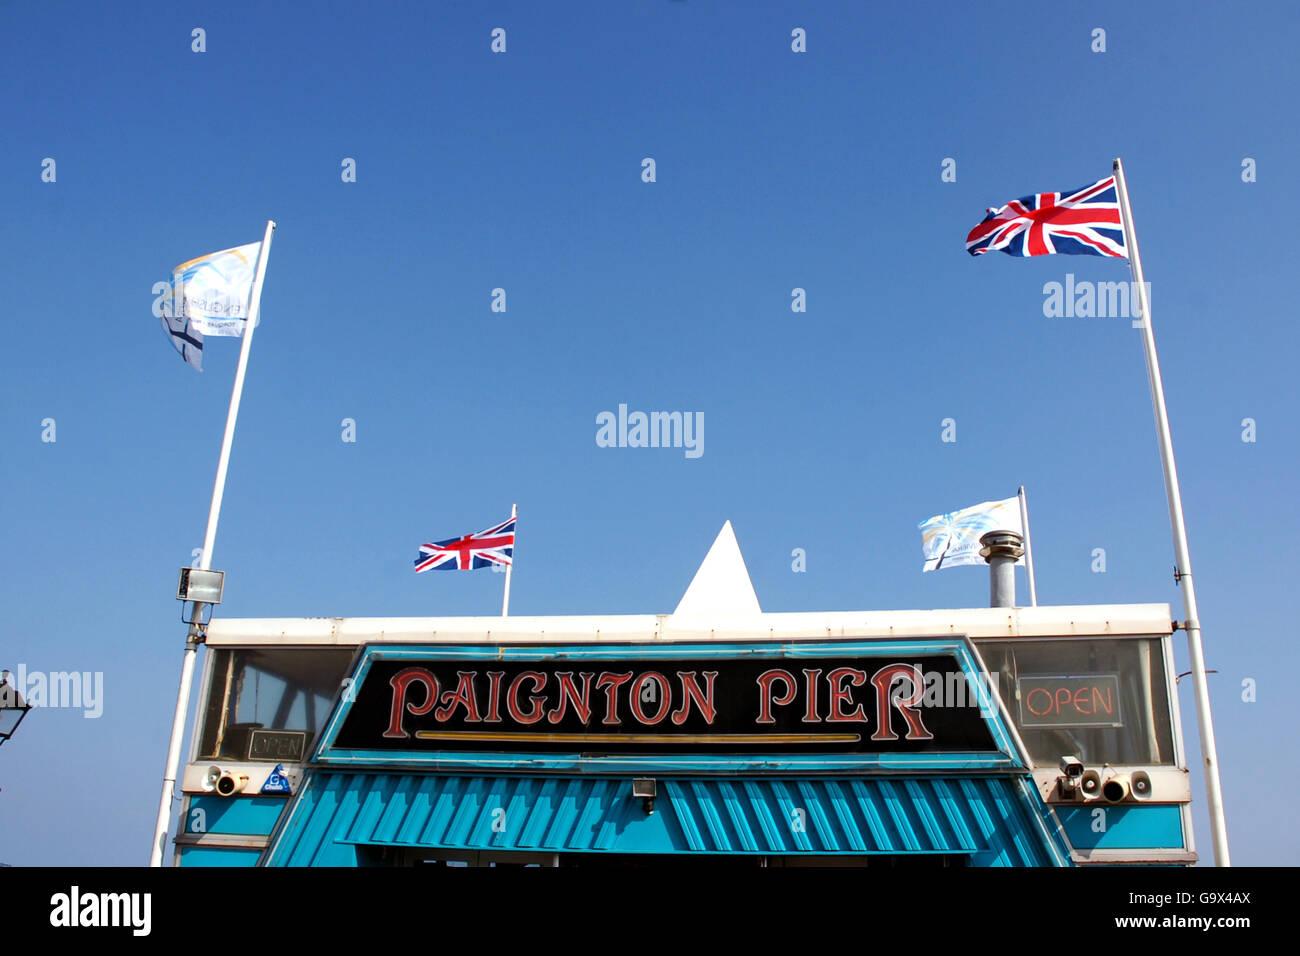 British Holidays - The Seaside - Paignton - 2007 Stock Photo